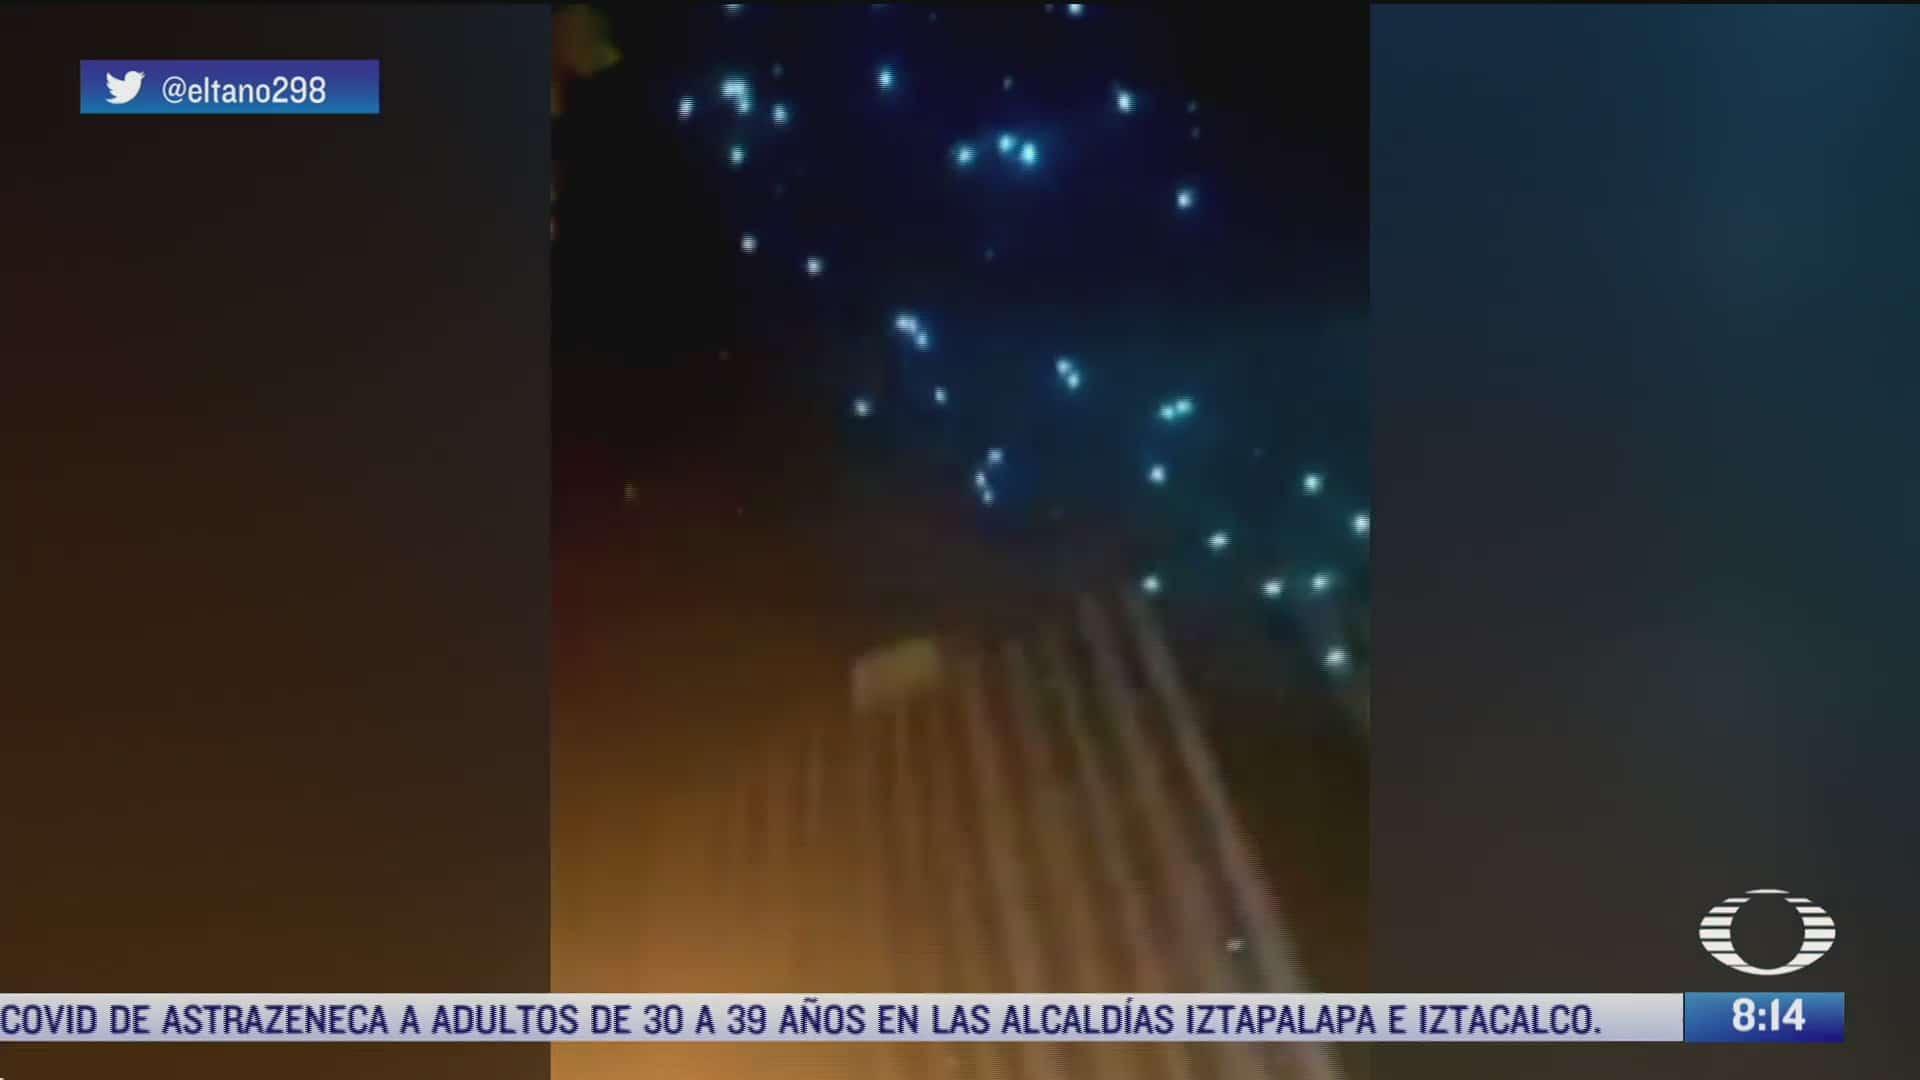 falla tecnica provoca que drones caigan sobre la gente